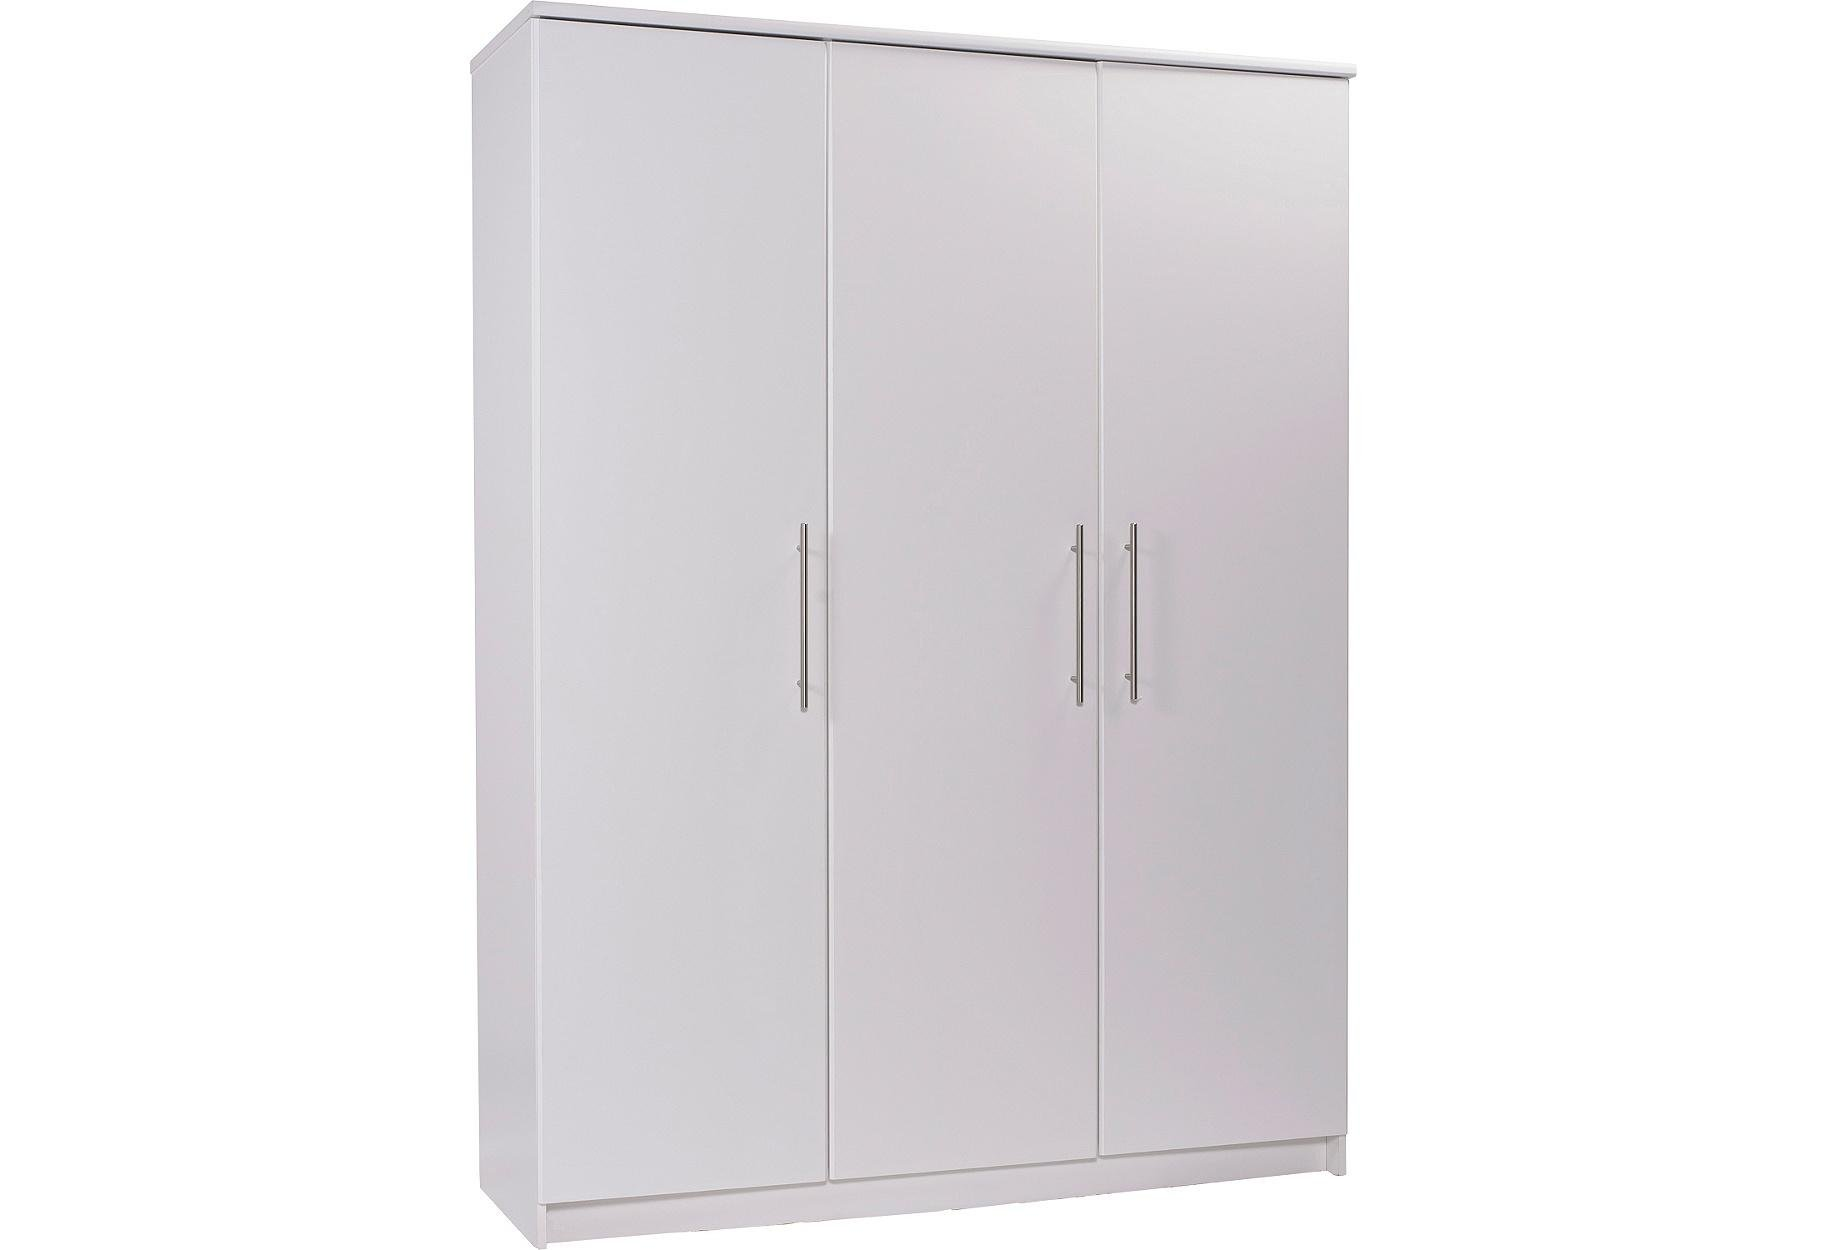 Argos Home Normandy 3 Door Wardrobe - White